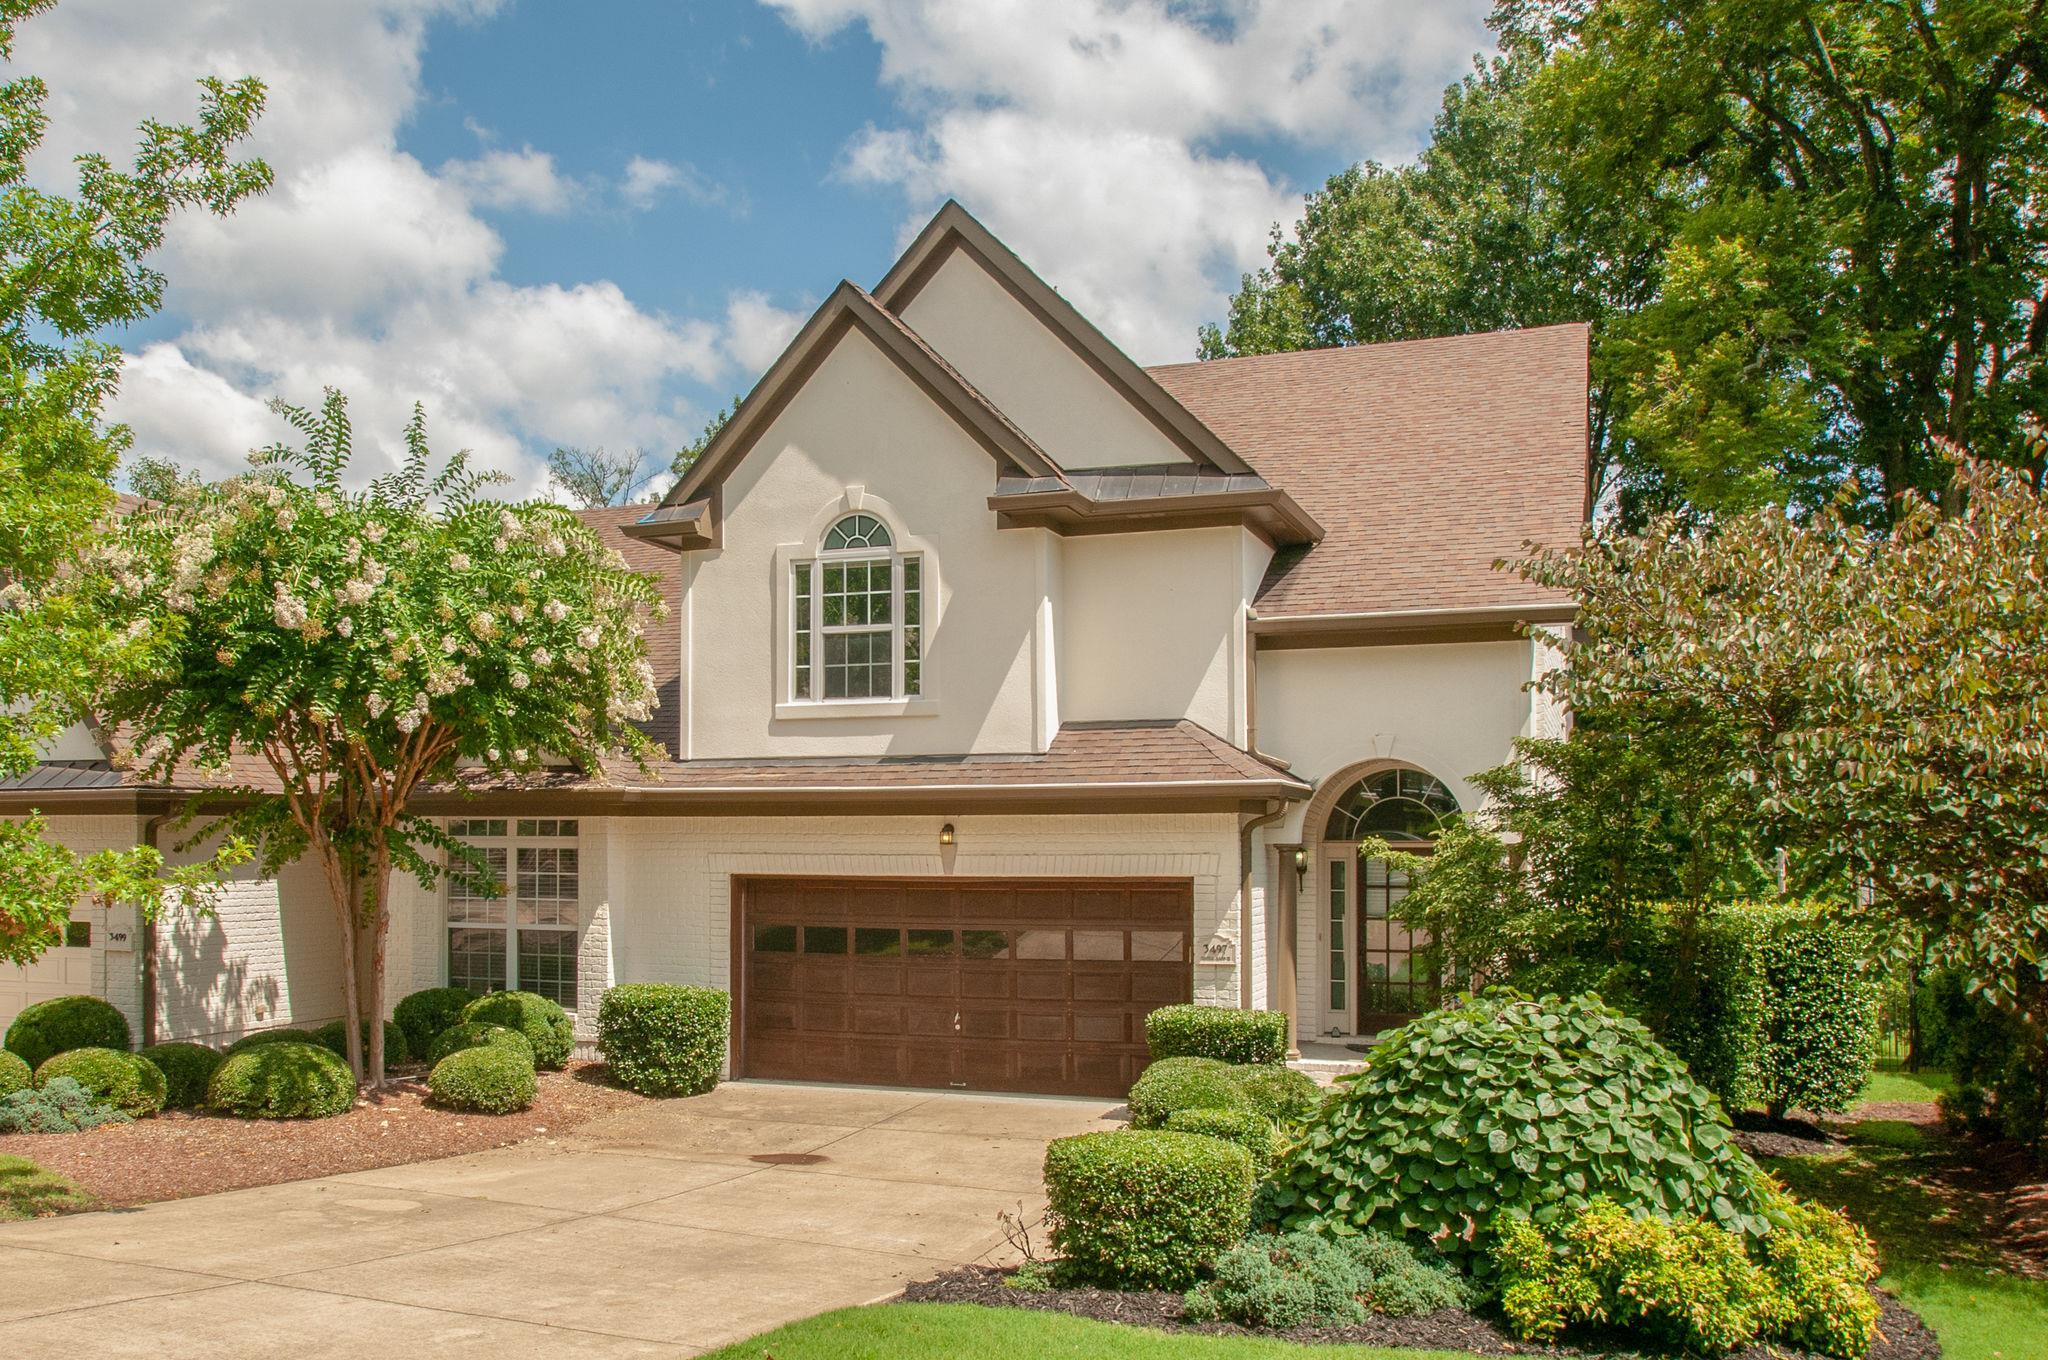 3497 General Hood Tr, Nashville, TN 37204 - Nashville, TN real estate listing